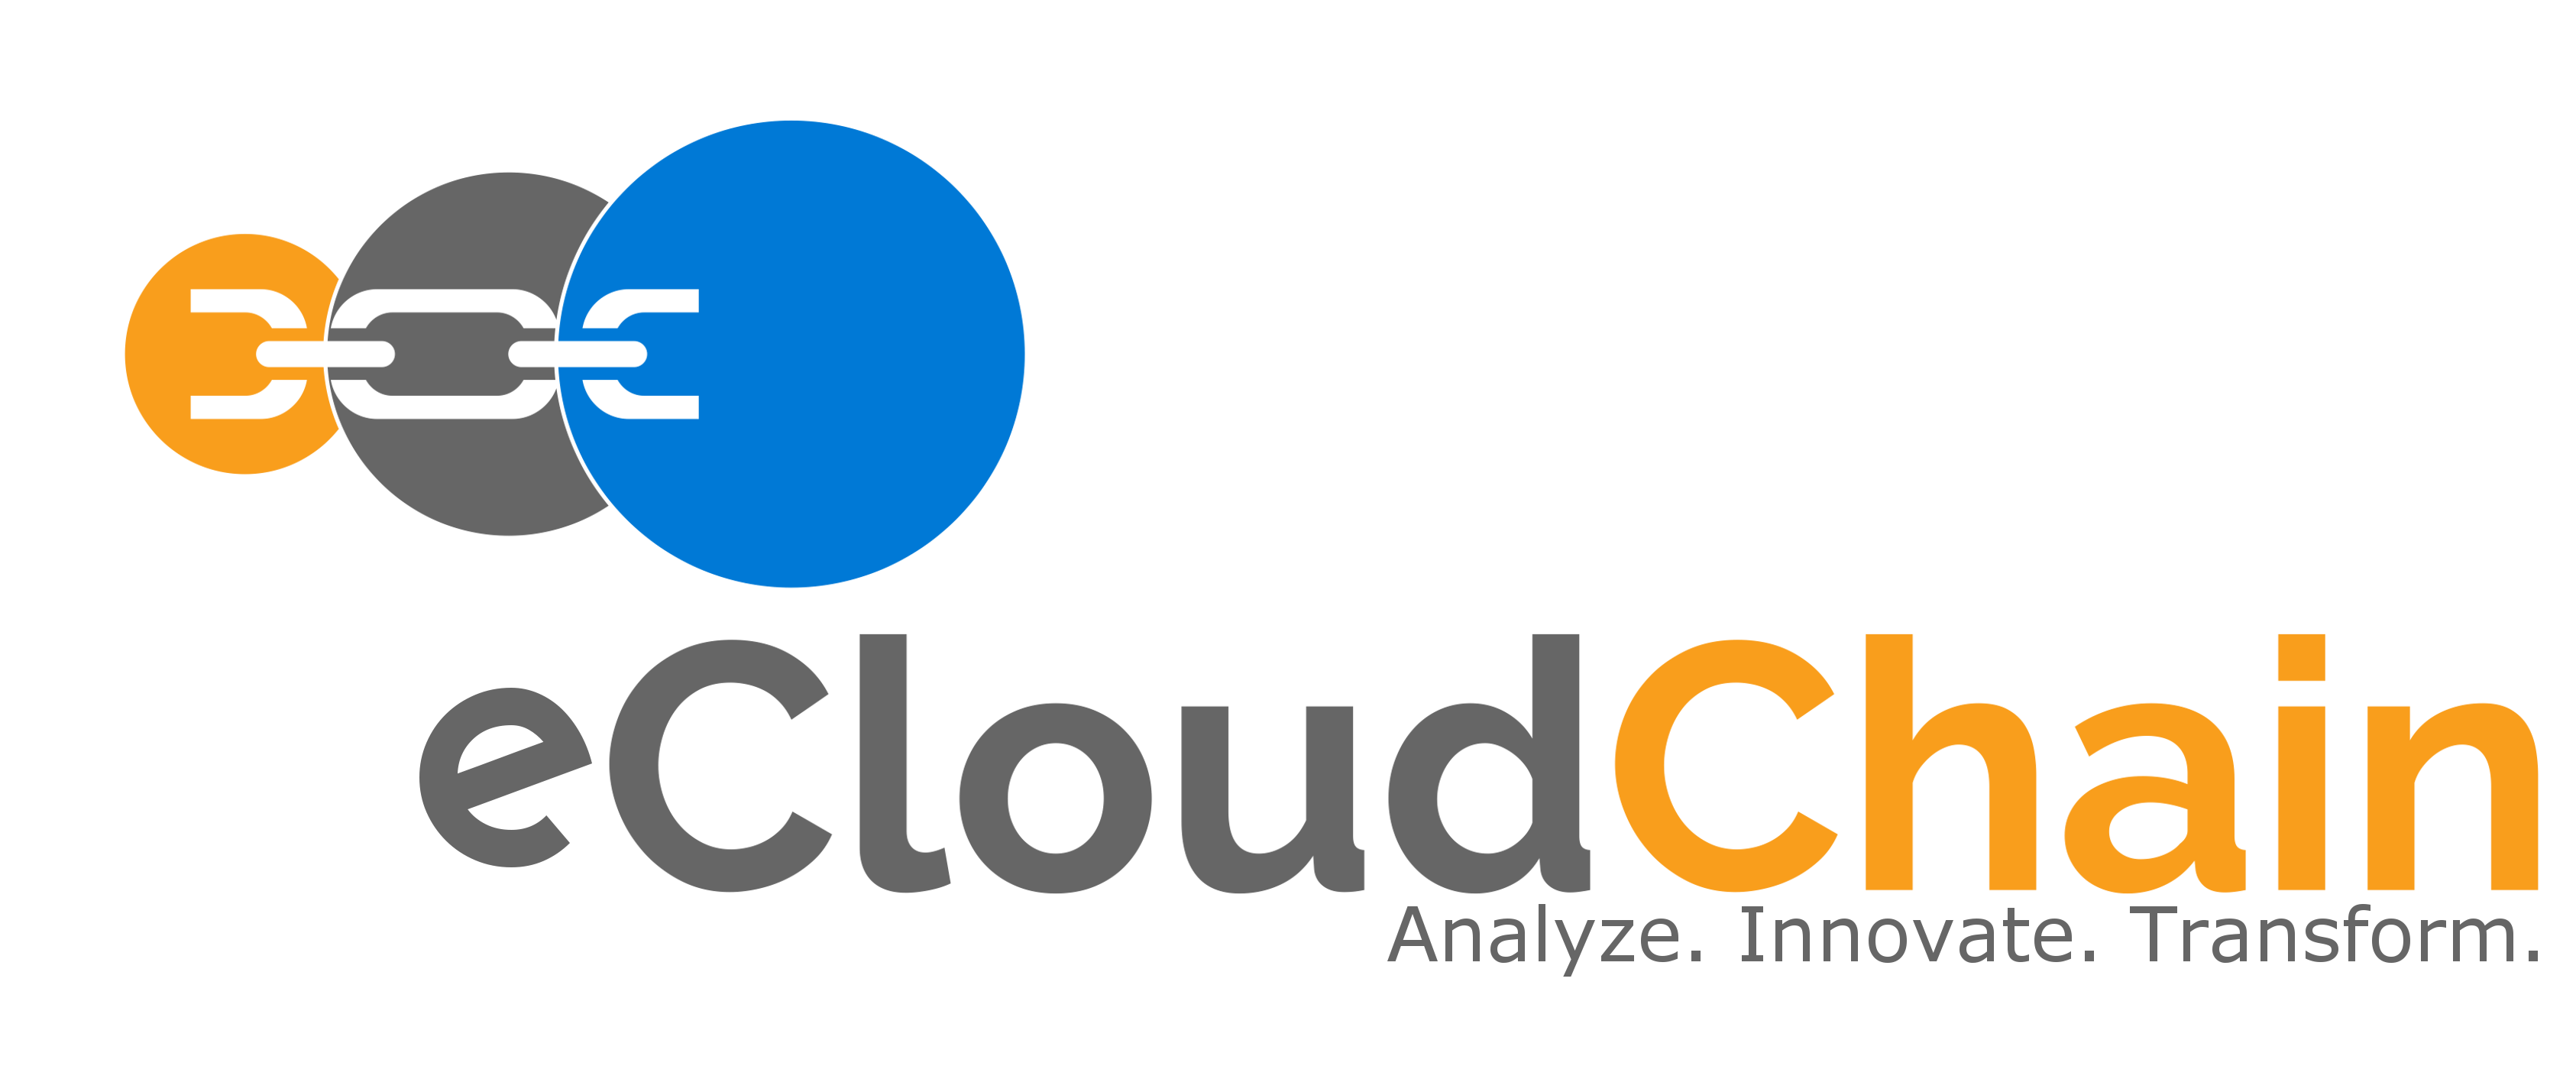 eCloudChain Company Logo Header